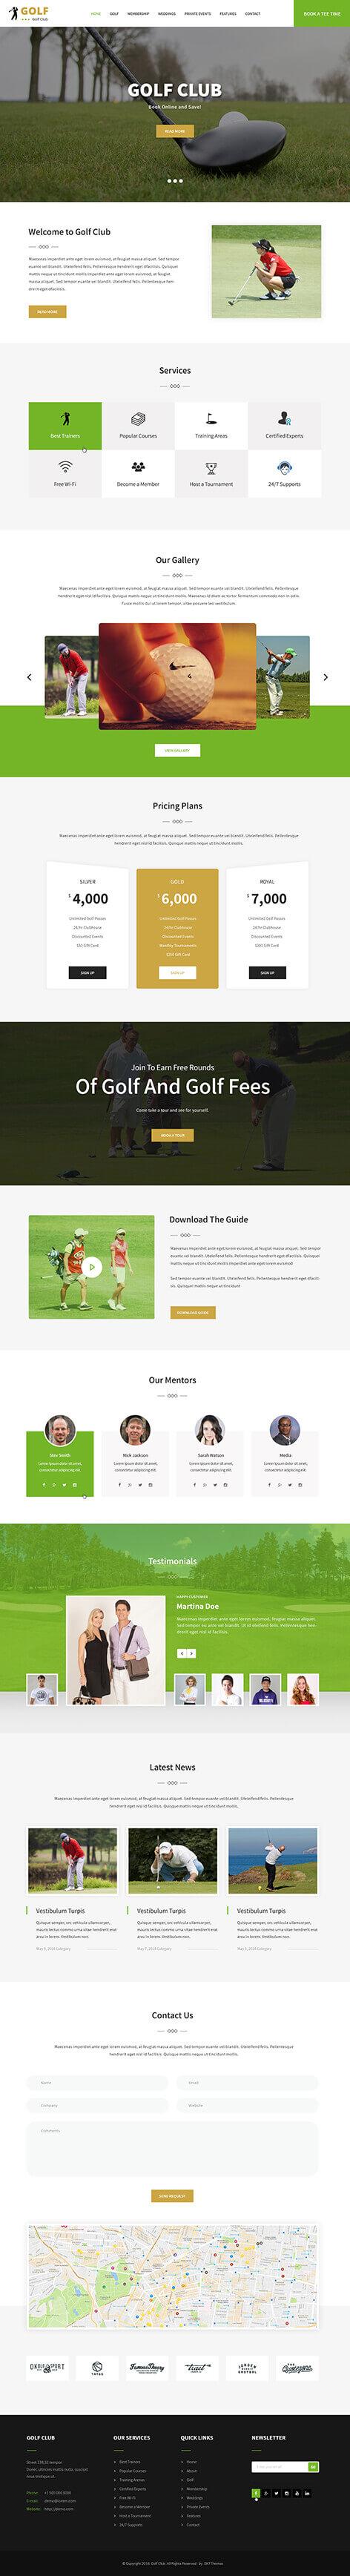 sports team WordPress theme